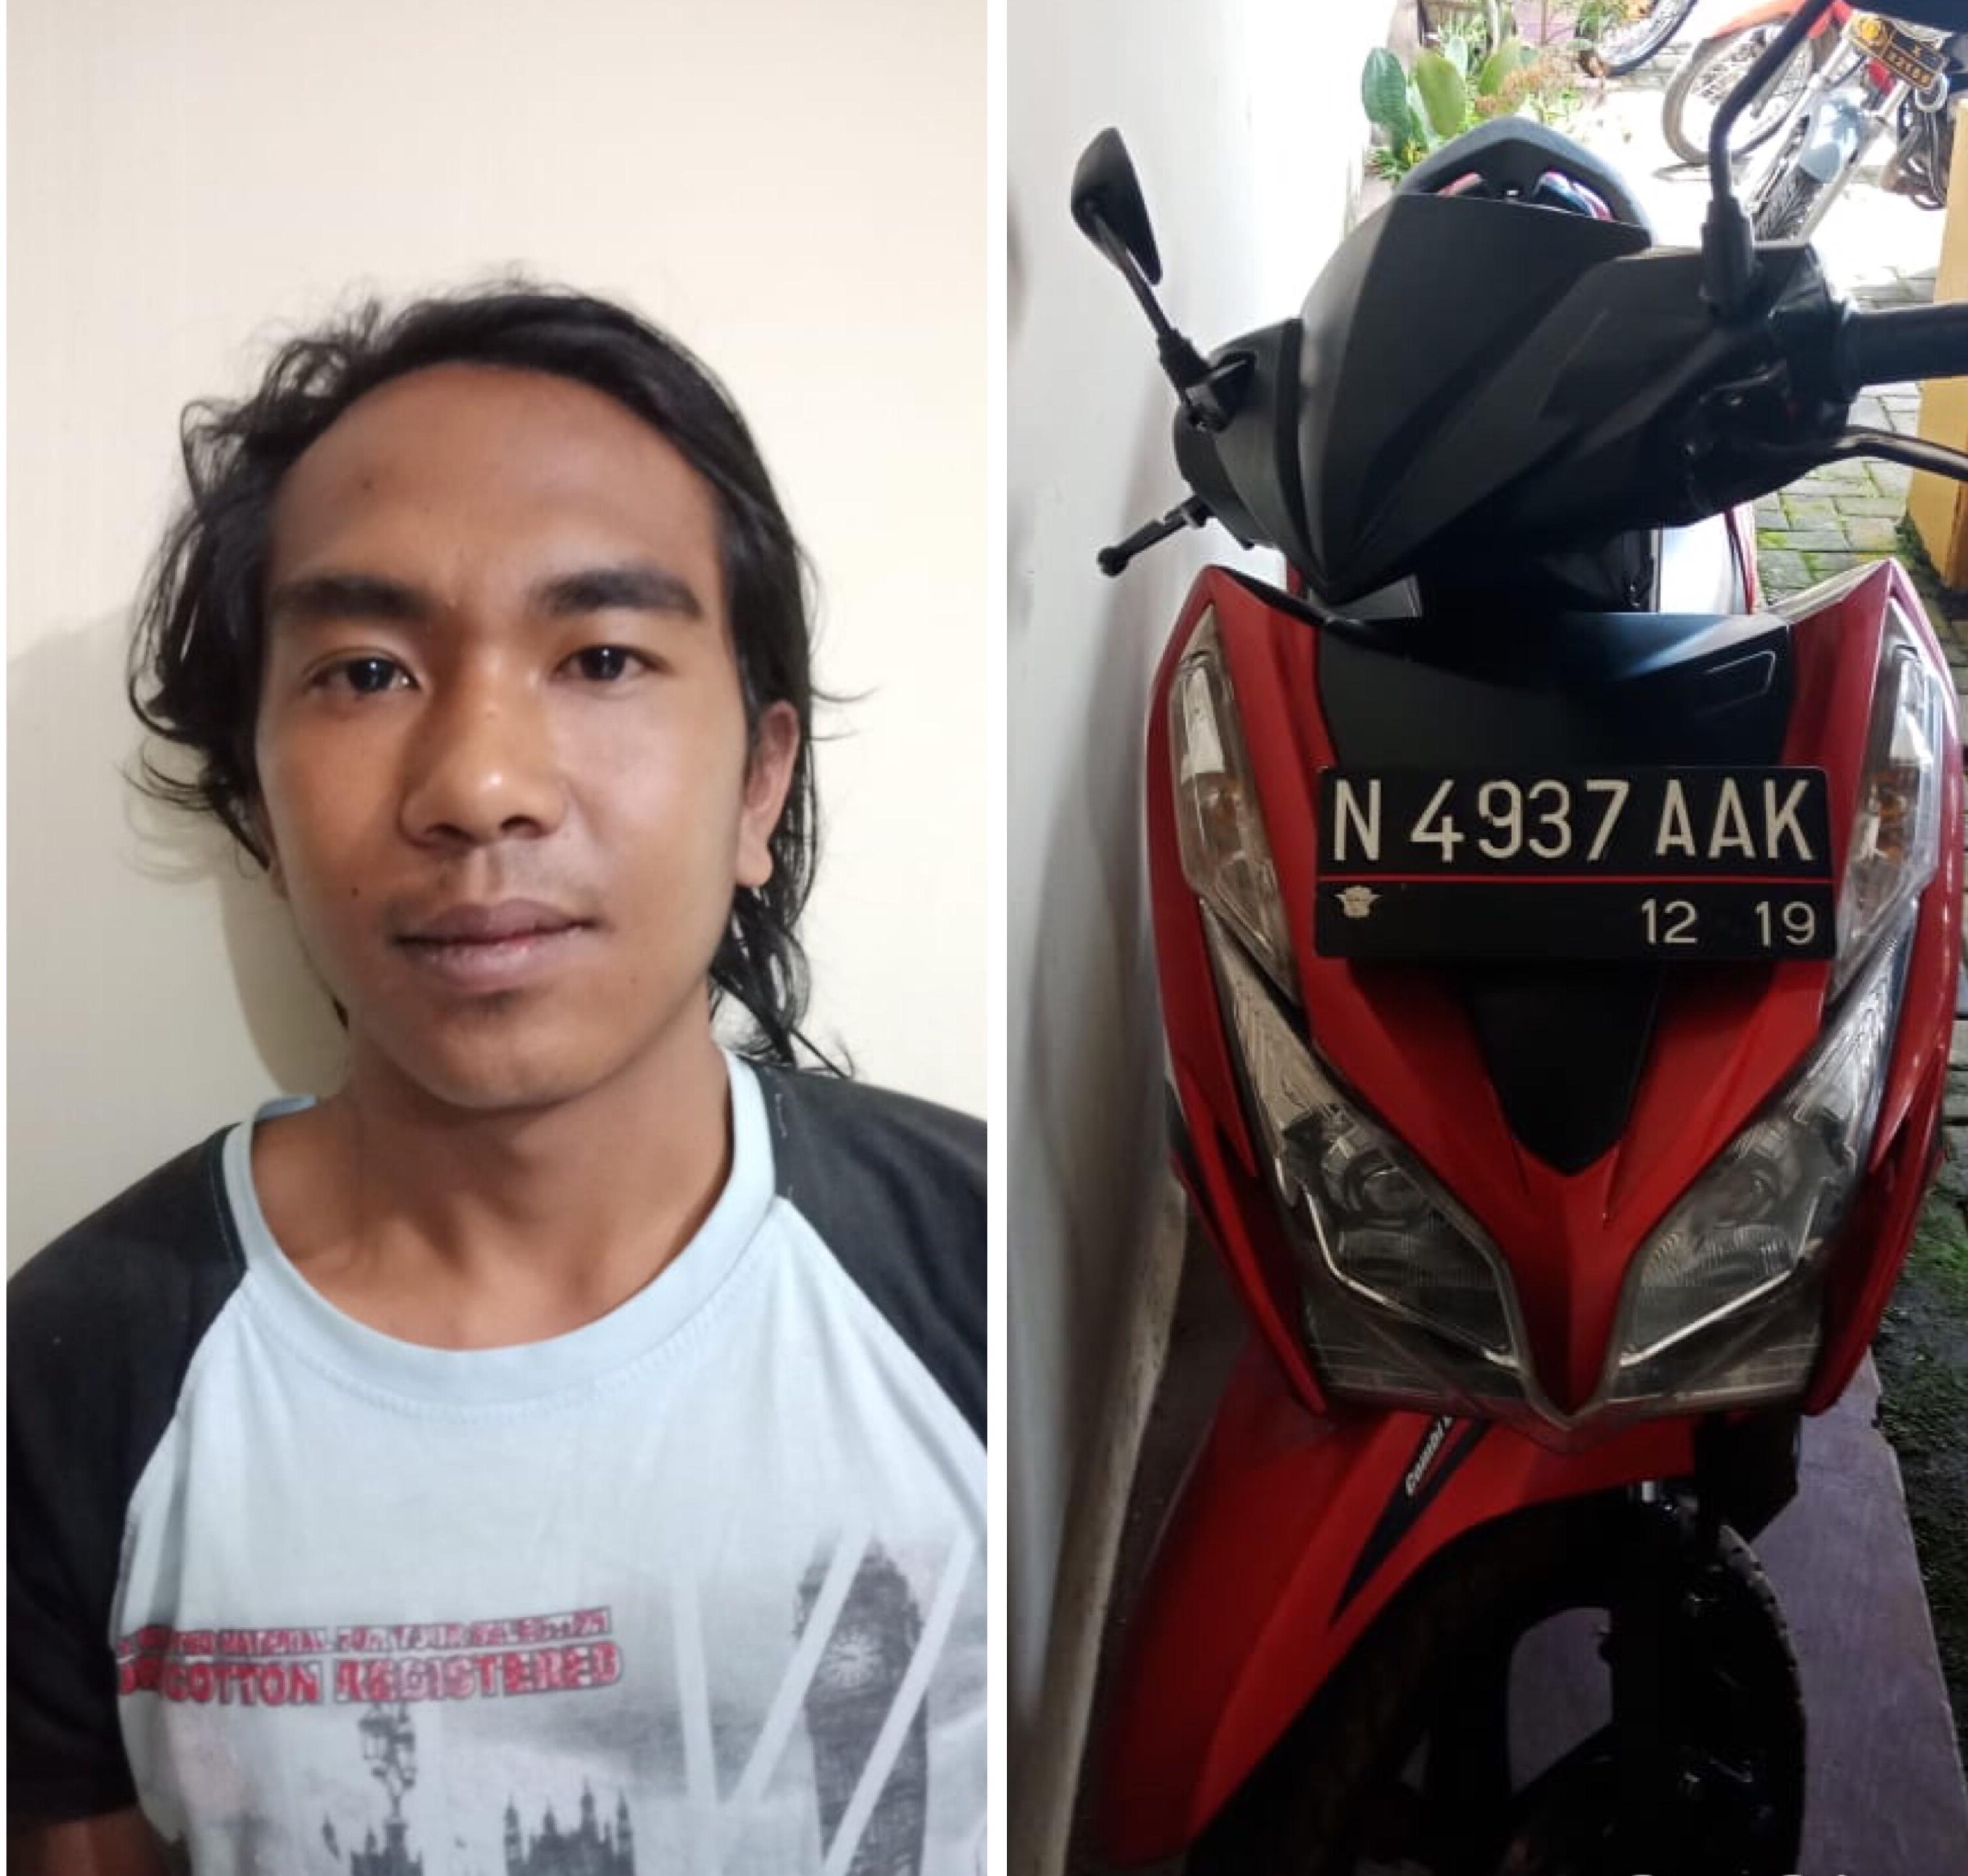 Muhammad Safi�i beserta barang bukti hasil pencurian saat diamankan polisi, Kecamatan Jabung (Foto : Humas Polres Malang For MalangTIMES)